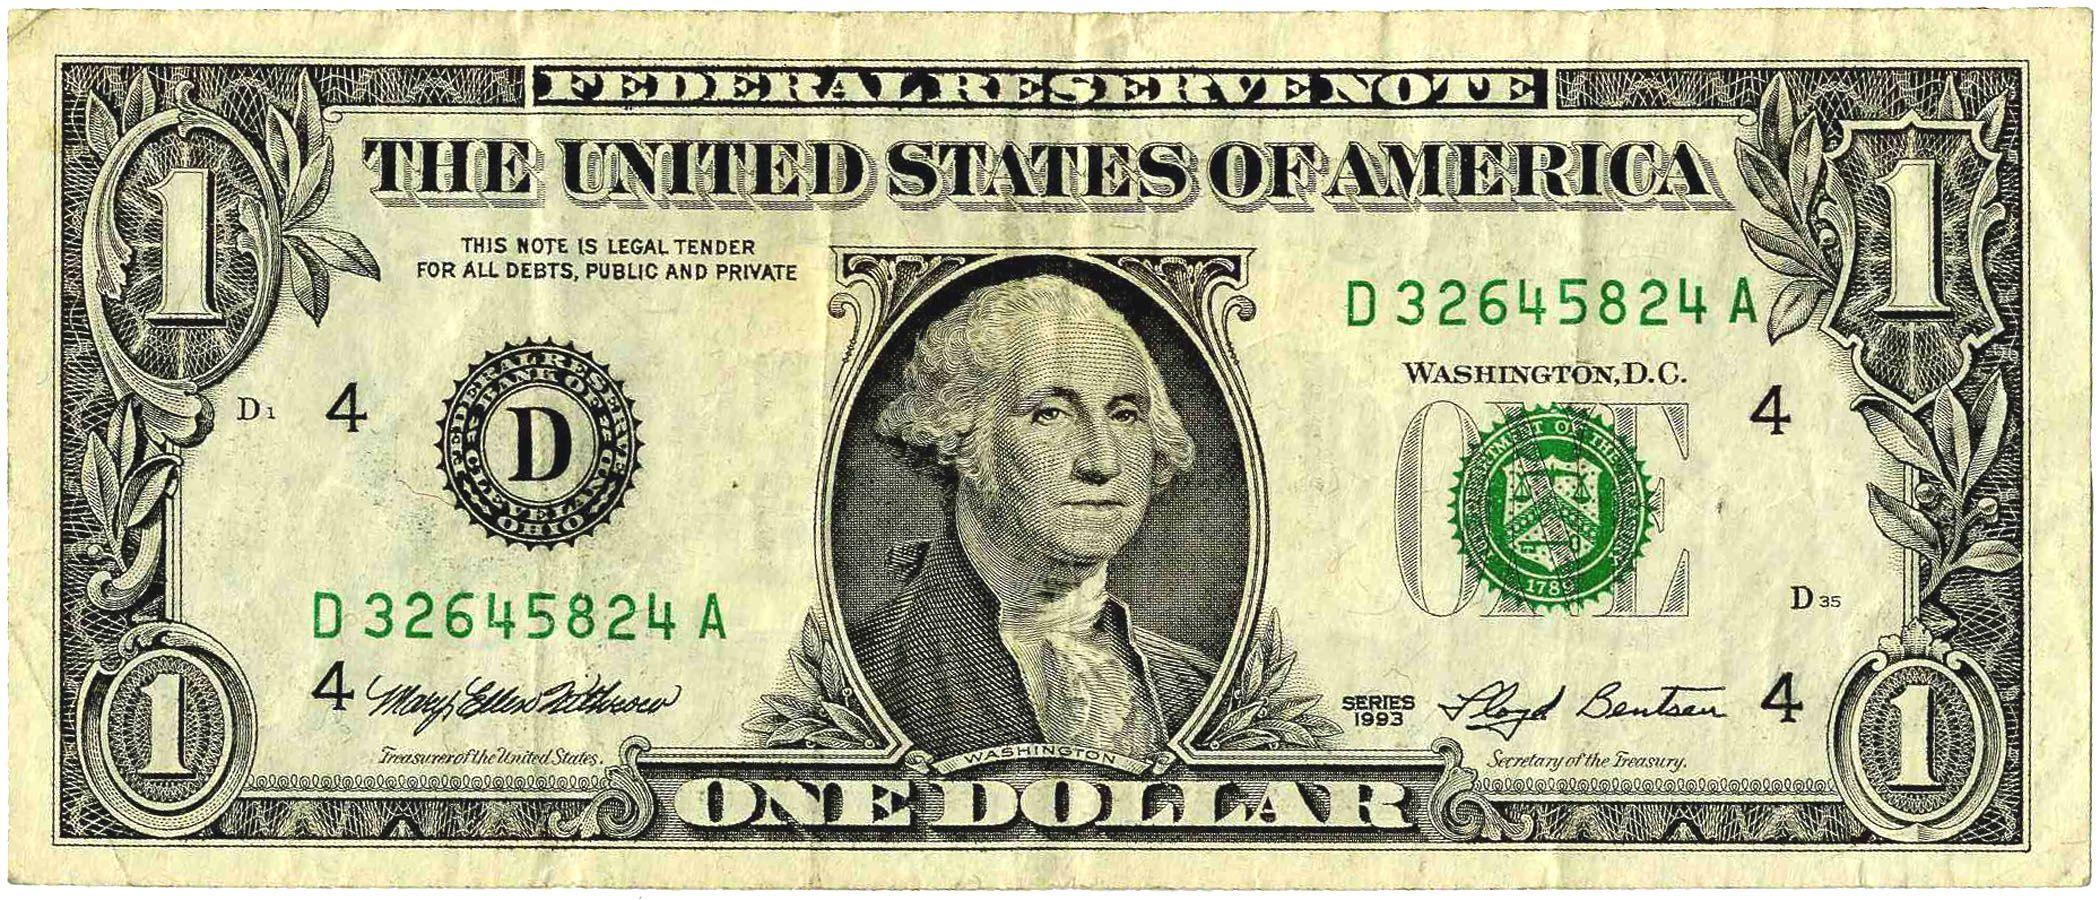 Trust image pertaining to fake printable money